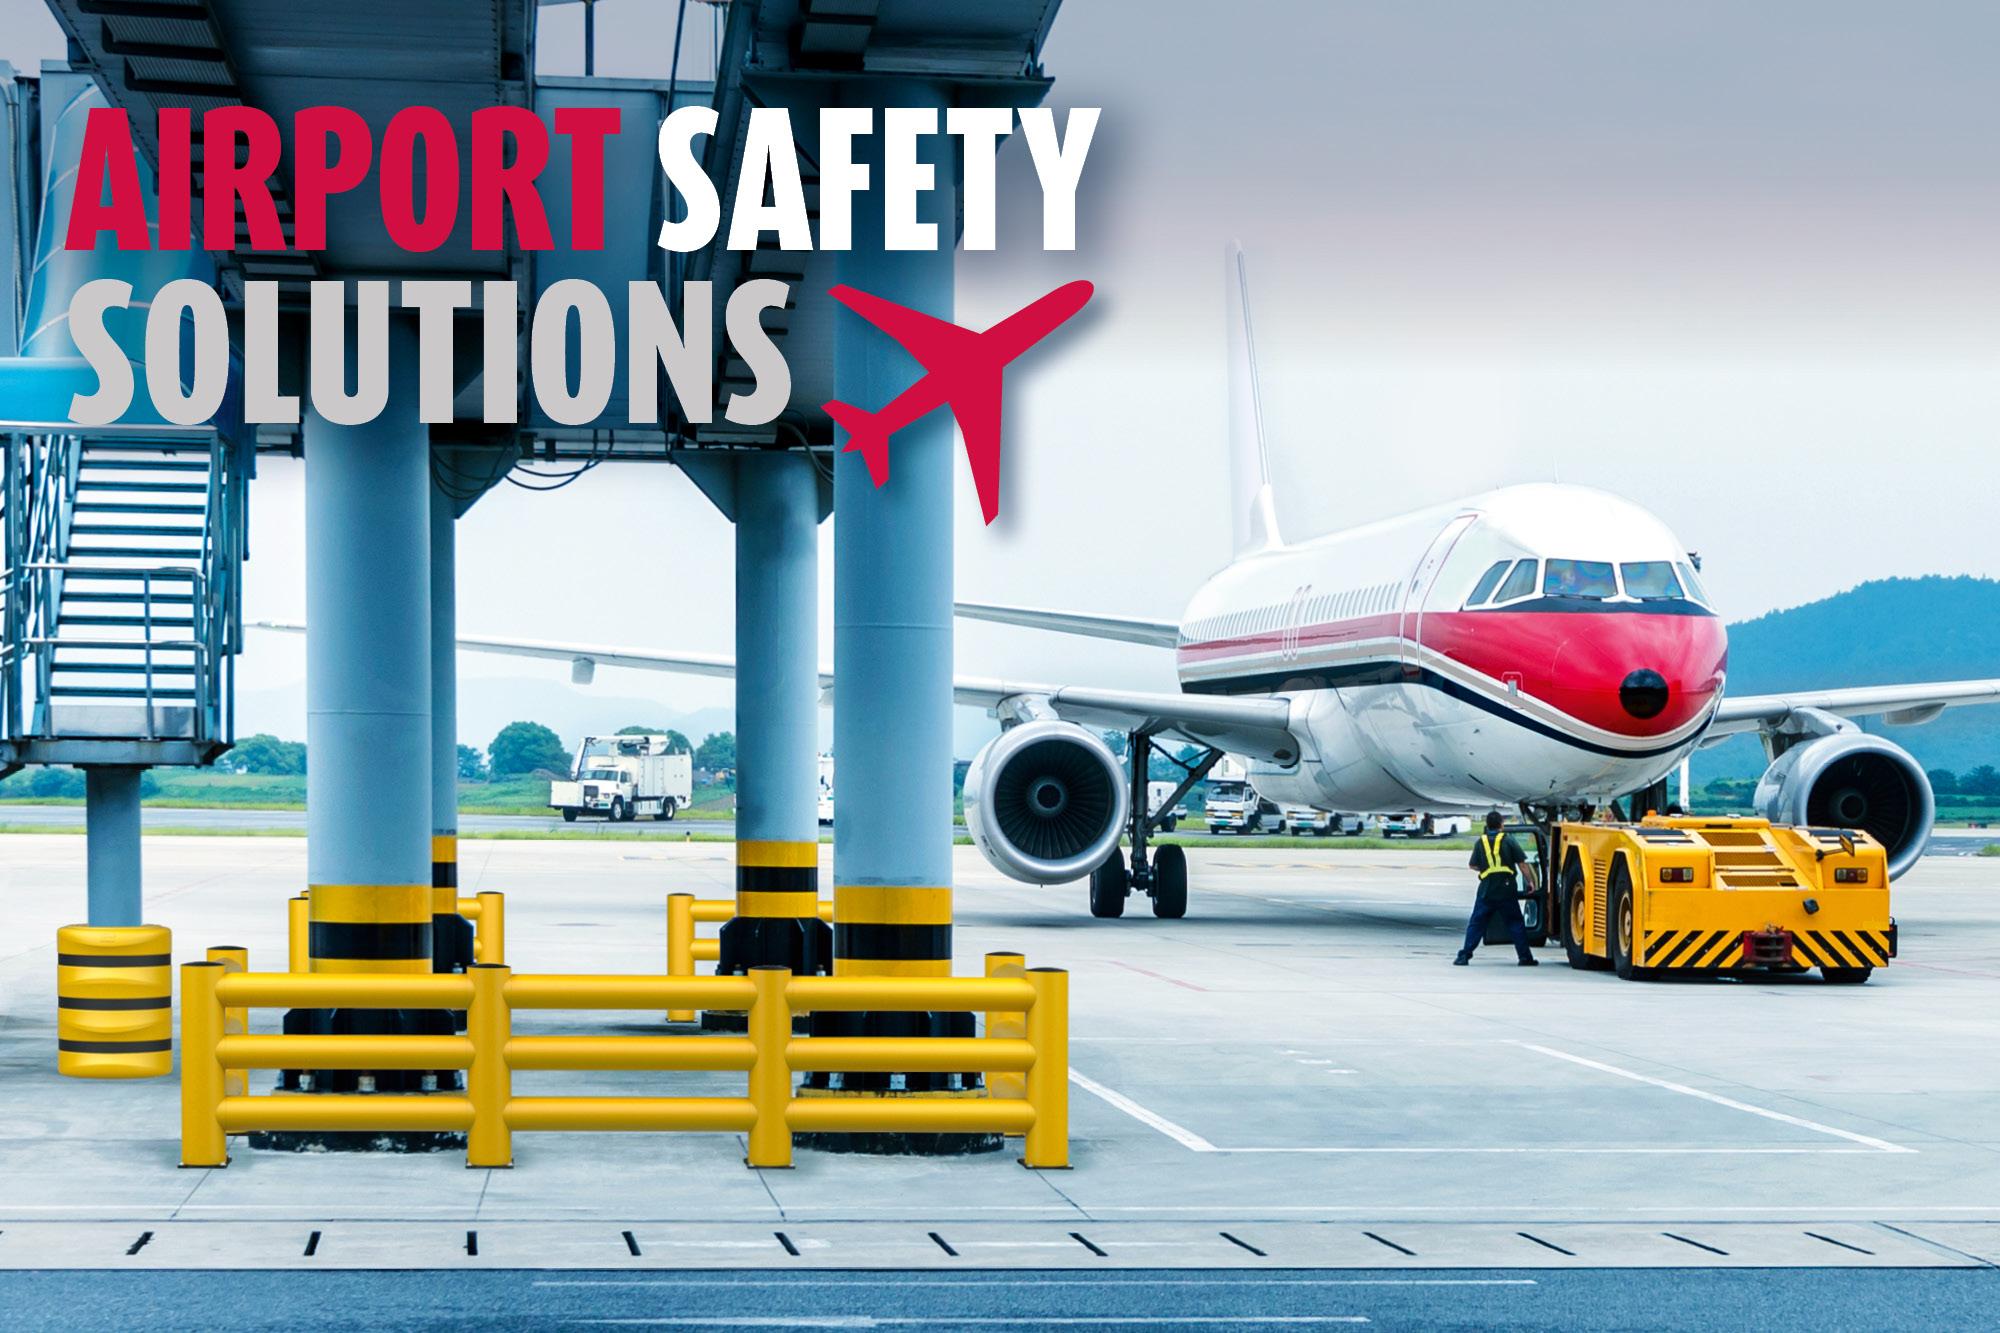 Protection anticollision aéroport